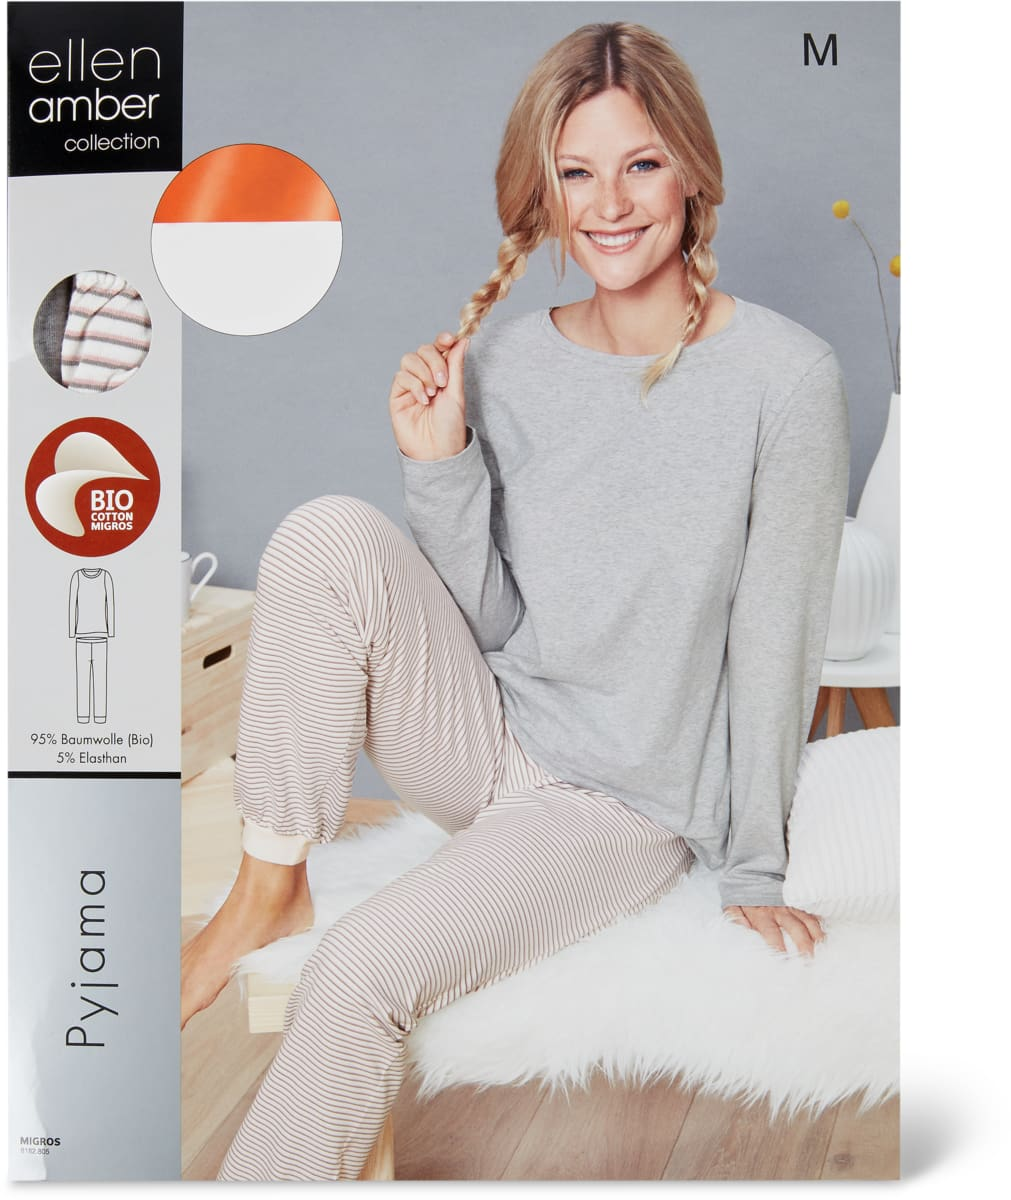 Ellen Amber Damen-Pyjama 2-teilig, Bio Cotton